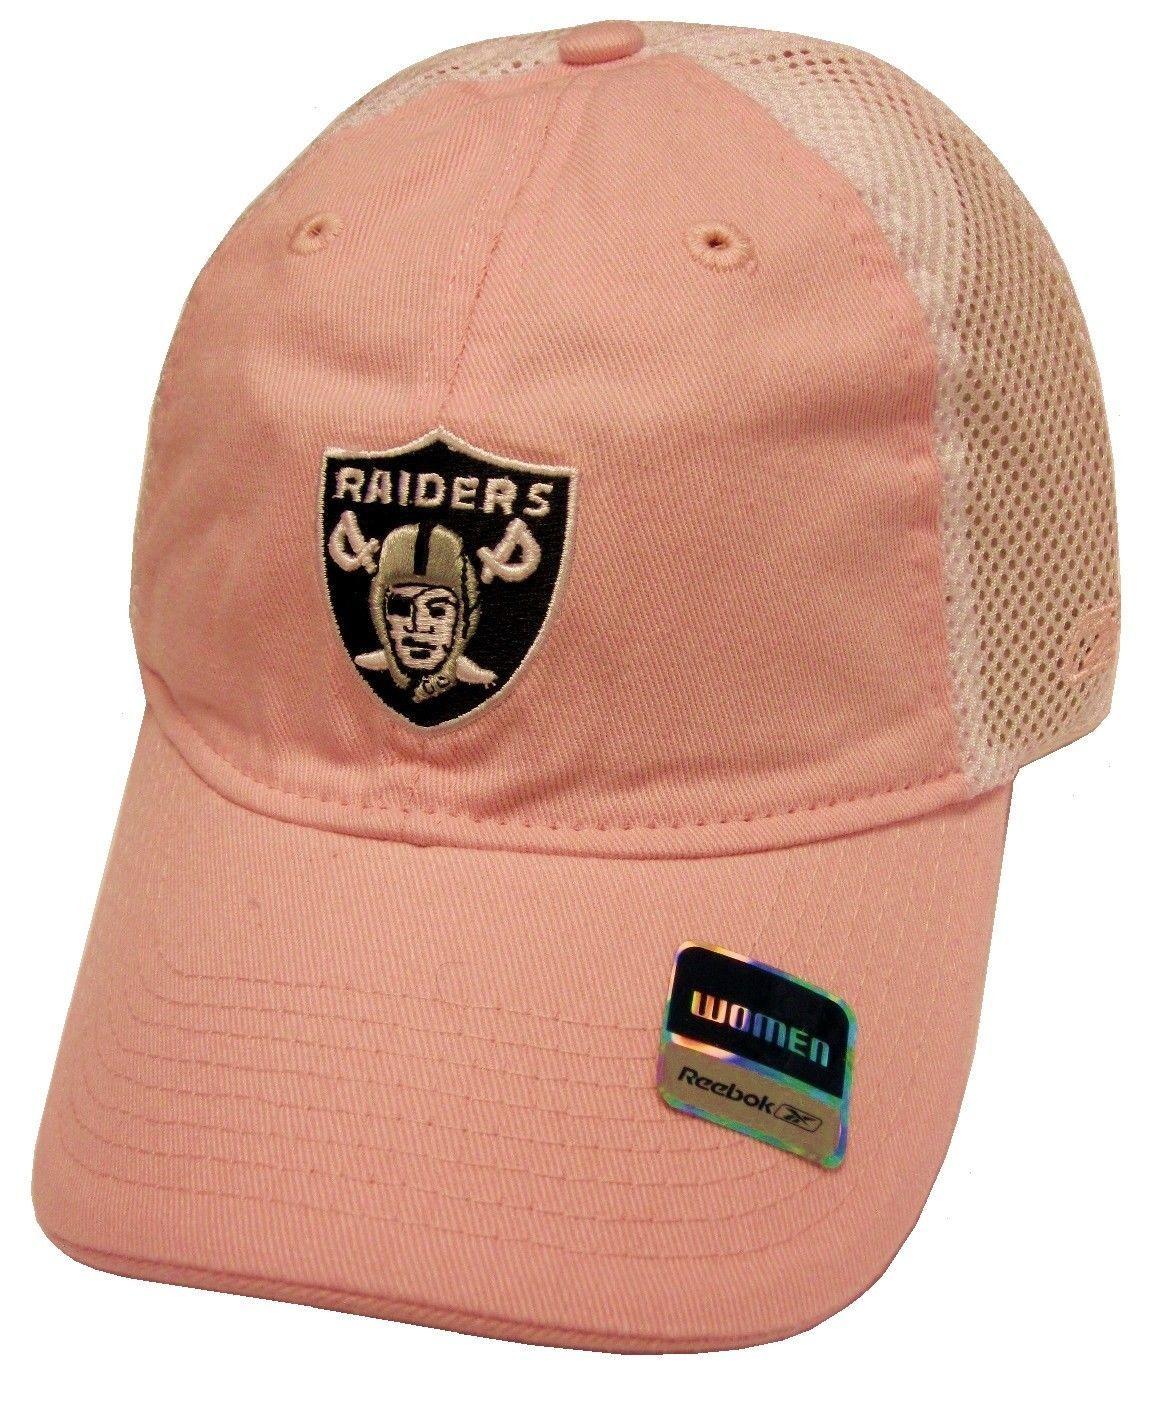 Oakland Raiders NFL Reebok Pastel Pink and 50 similar items 1fe704ecc5